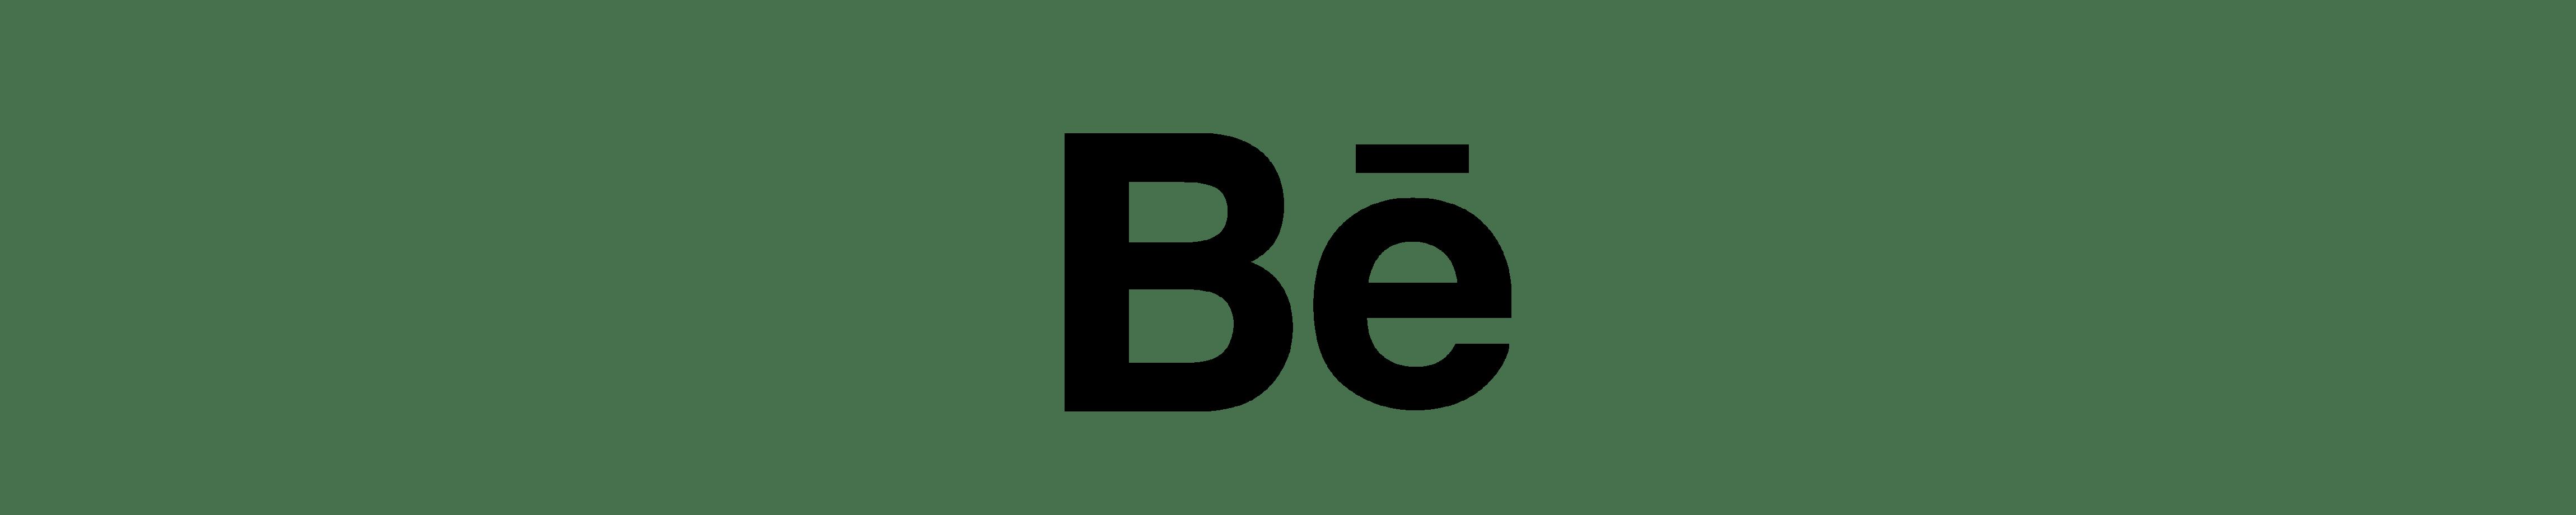 be_ok